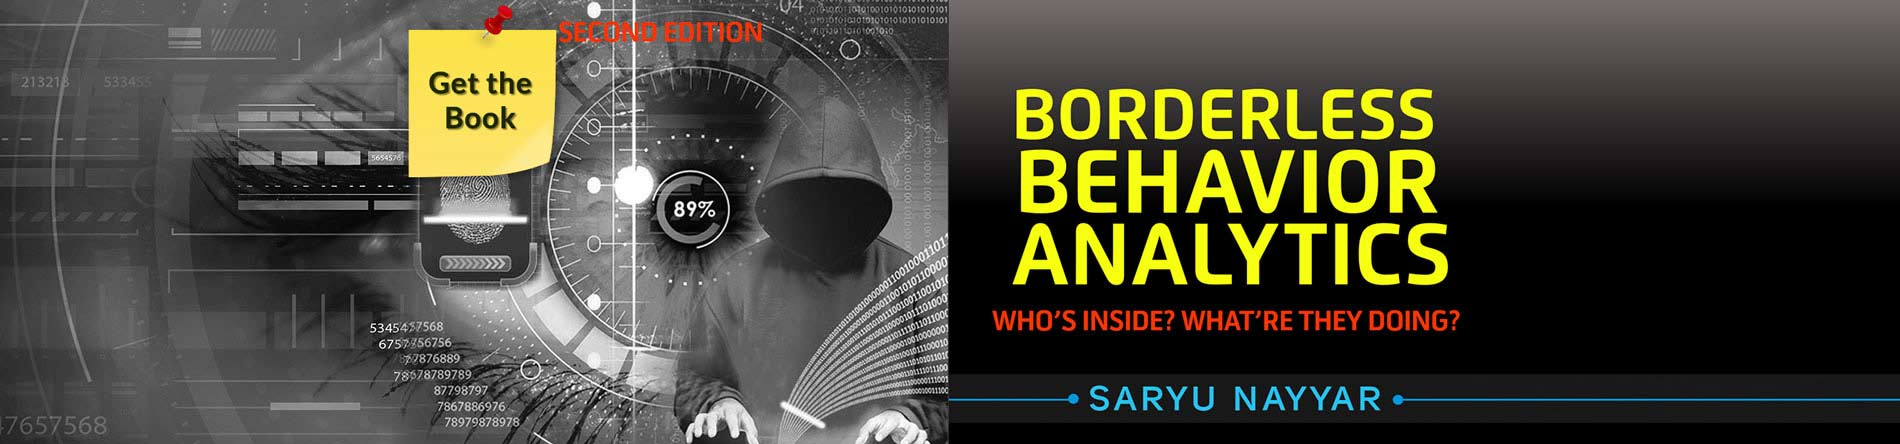 Borderless Behavior Analytics